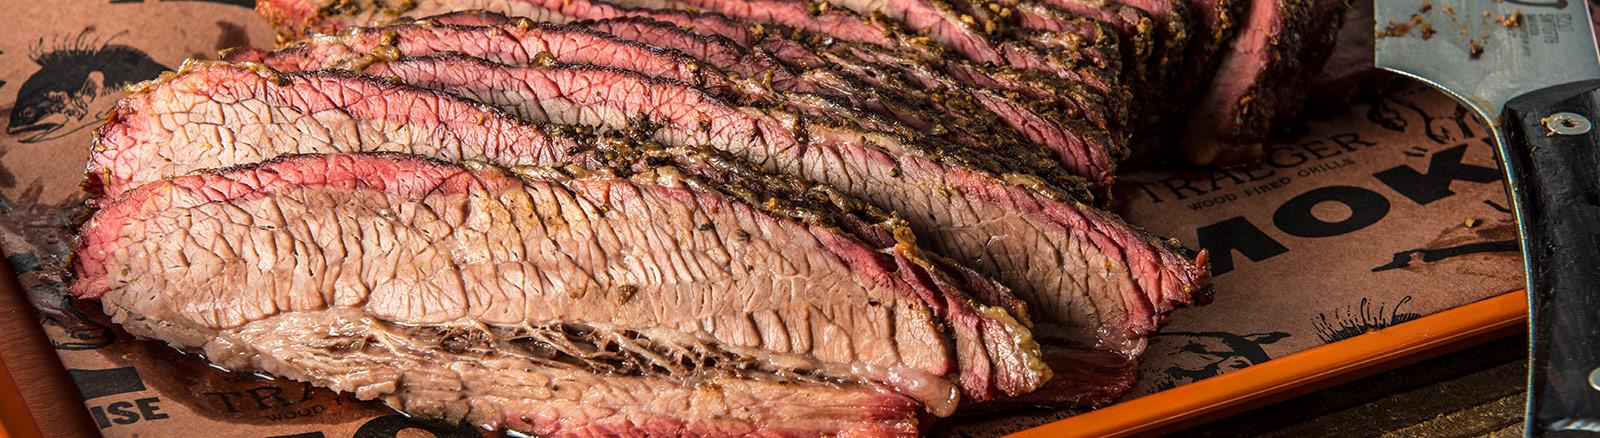 Texas Style BBQ Brisket by Doug Scheiding